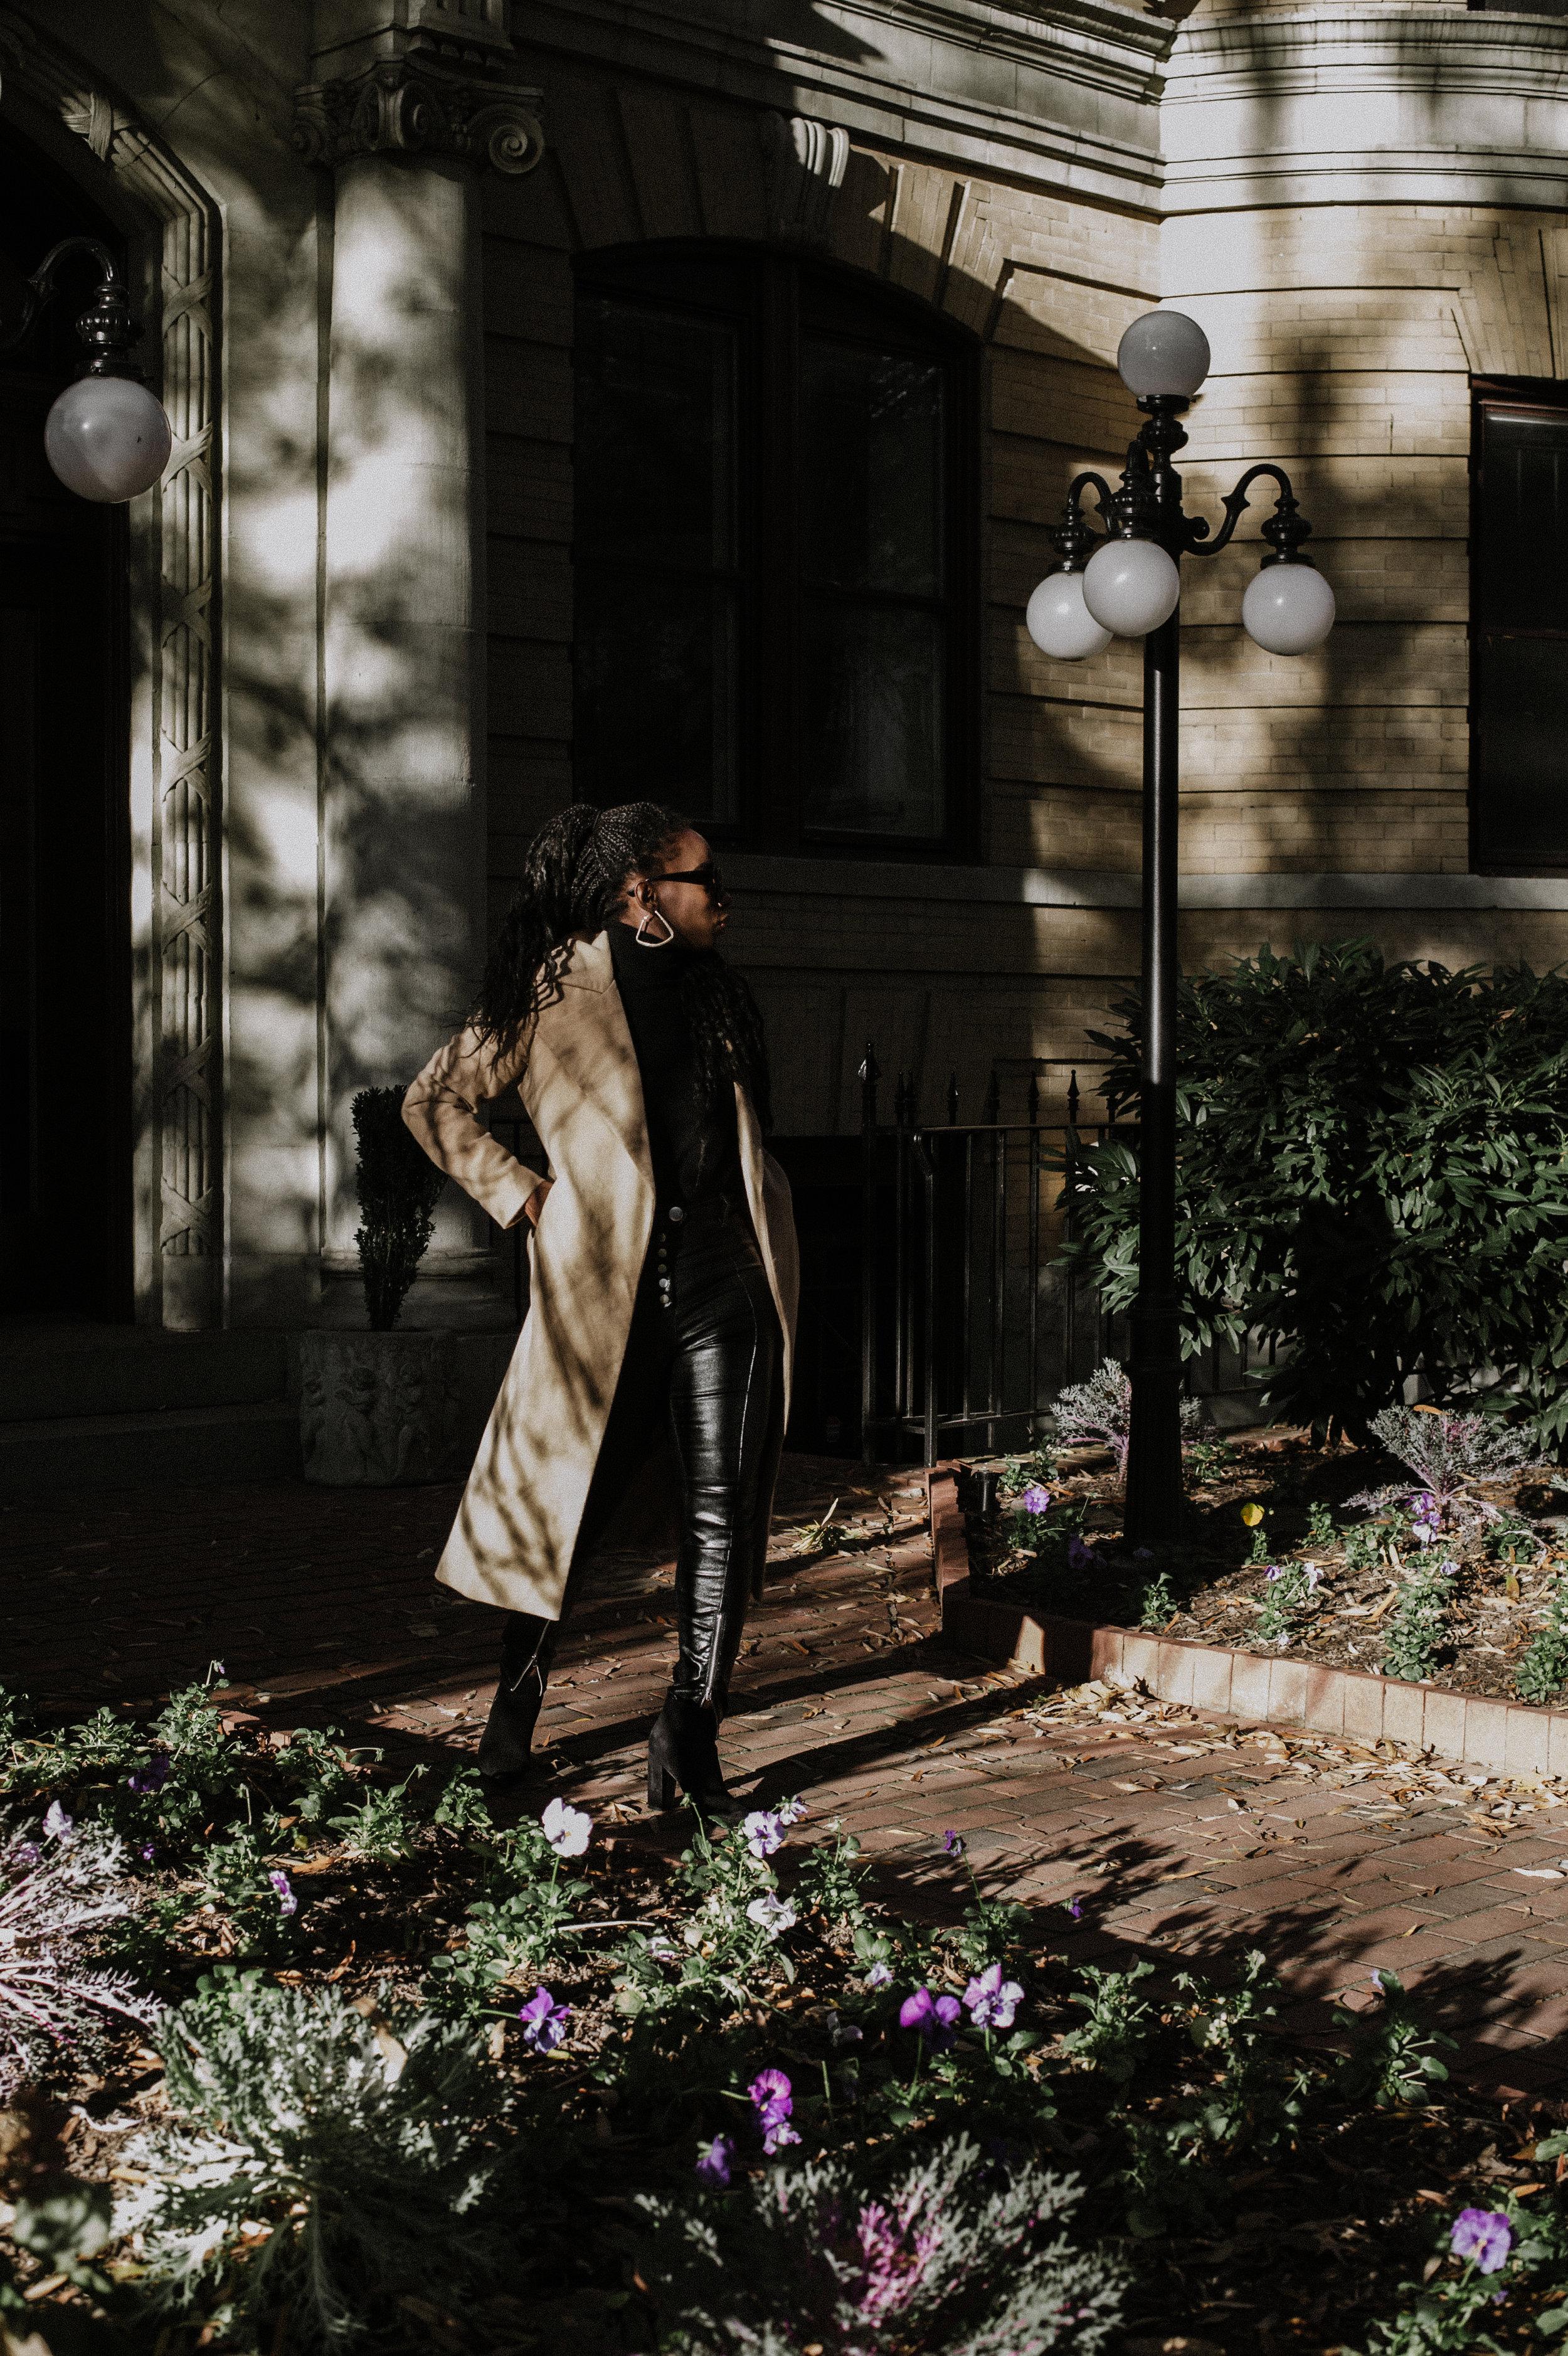 The-Glossier-Tasha-James-Fashion-Style-Blogger-DC-Winter-Coat-All-Black-8.jpg